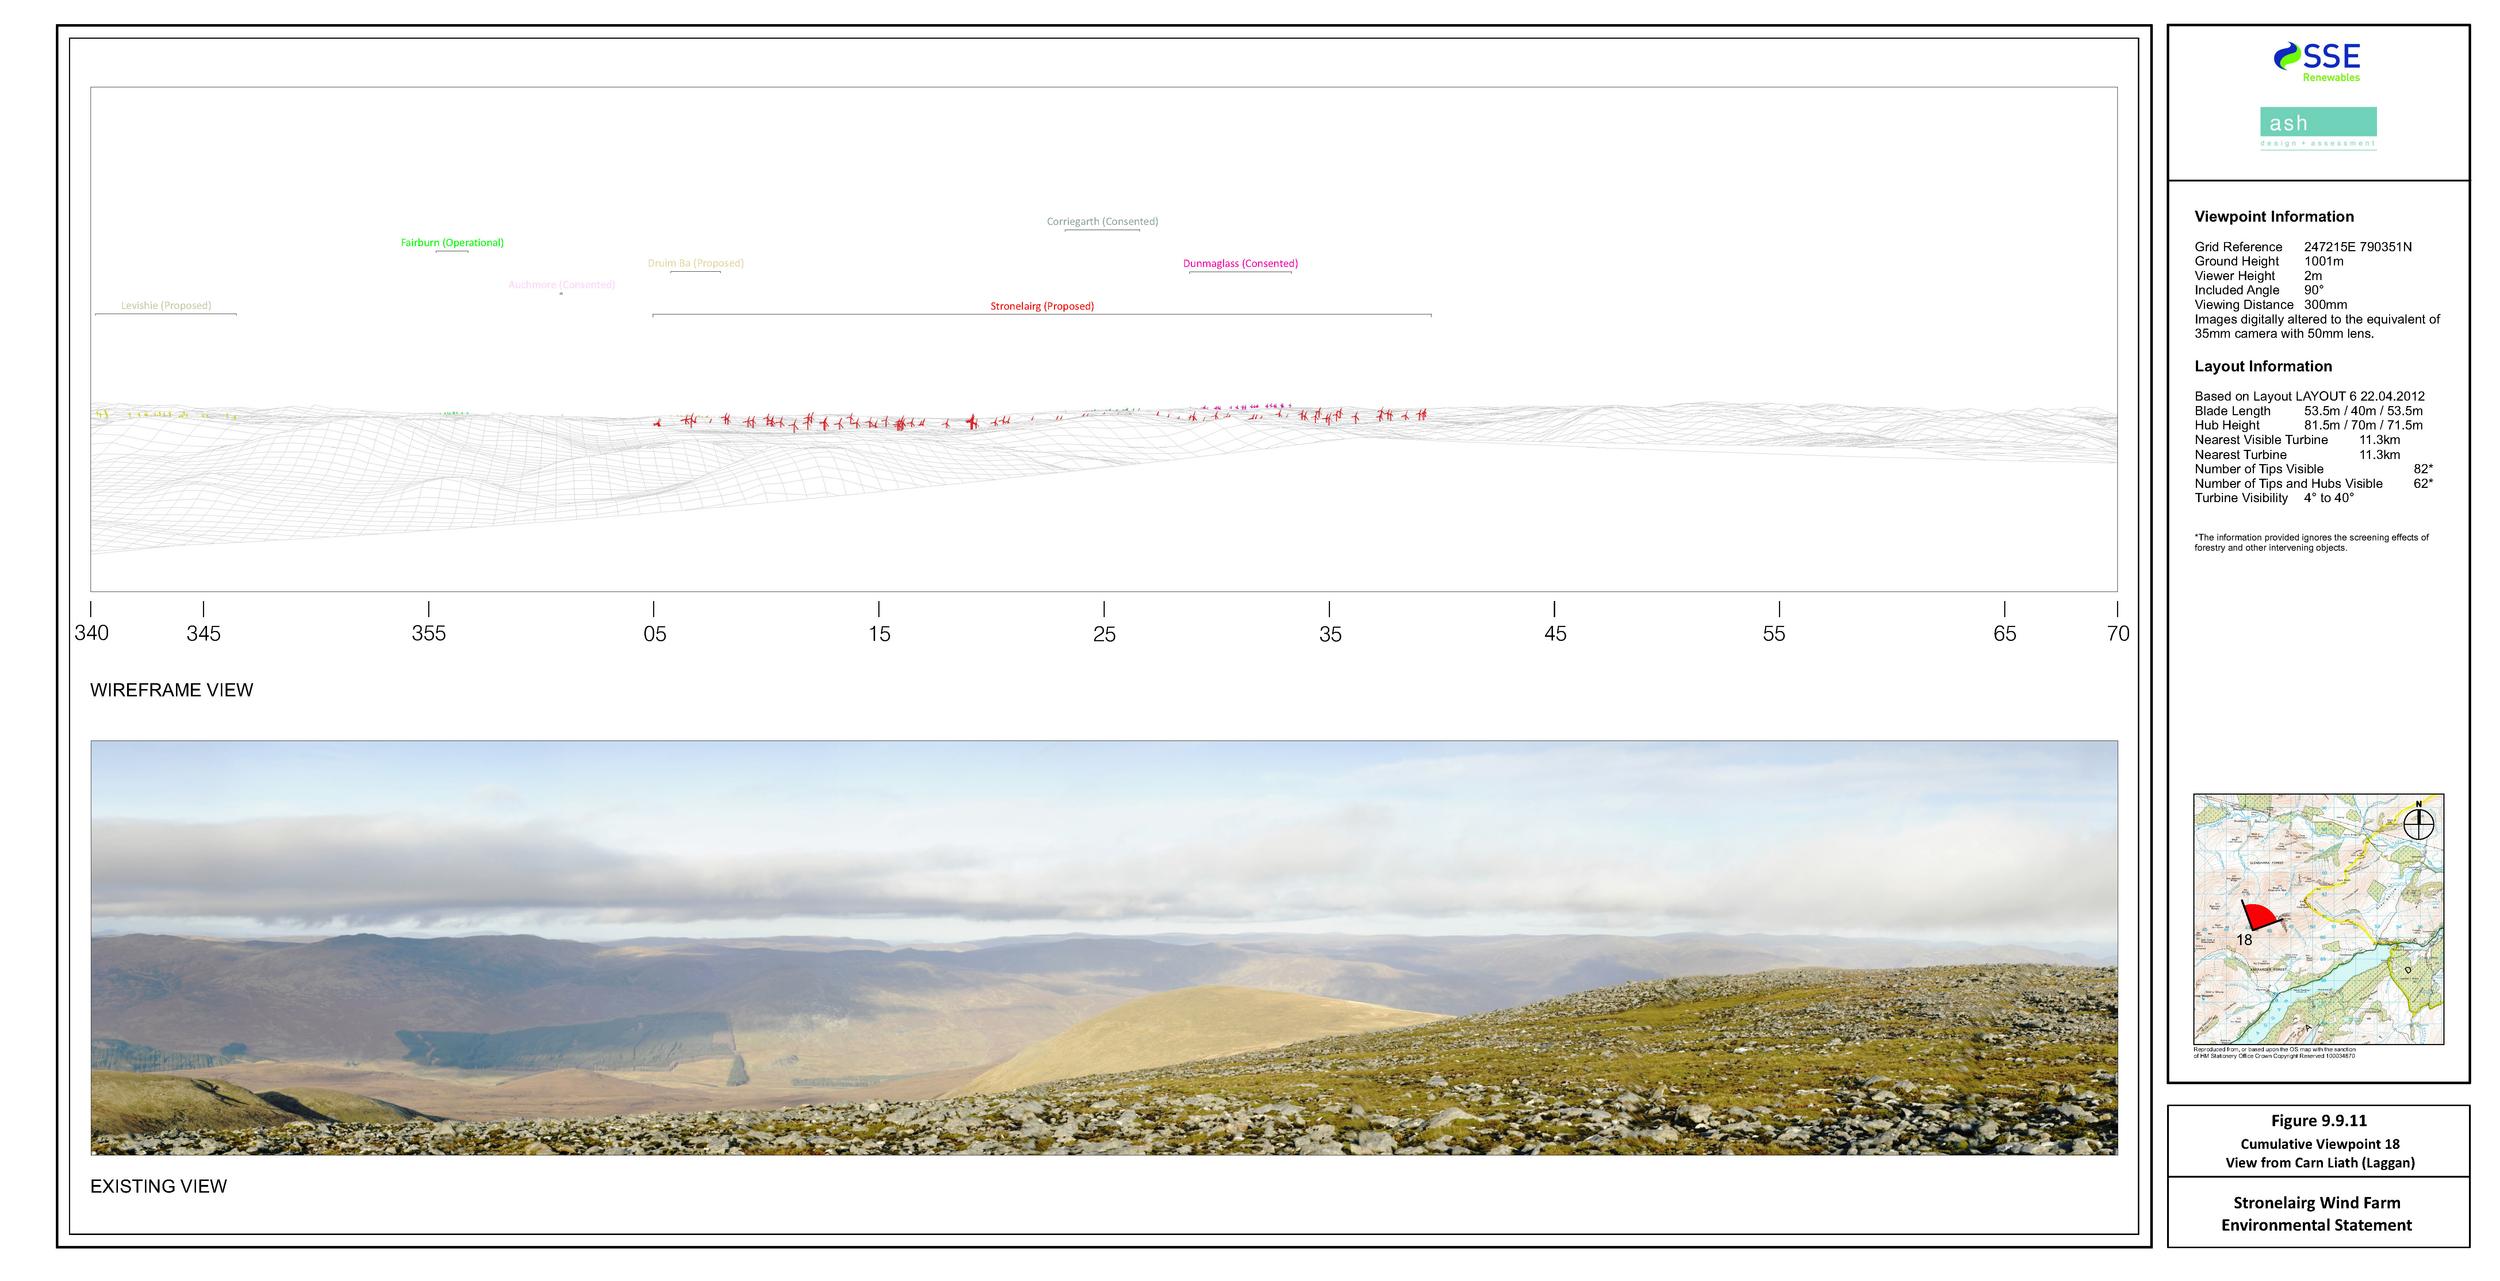 Stronelairg Figure 9.9.11 - Cumulative Viewpoint 18.jpg